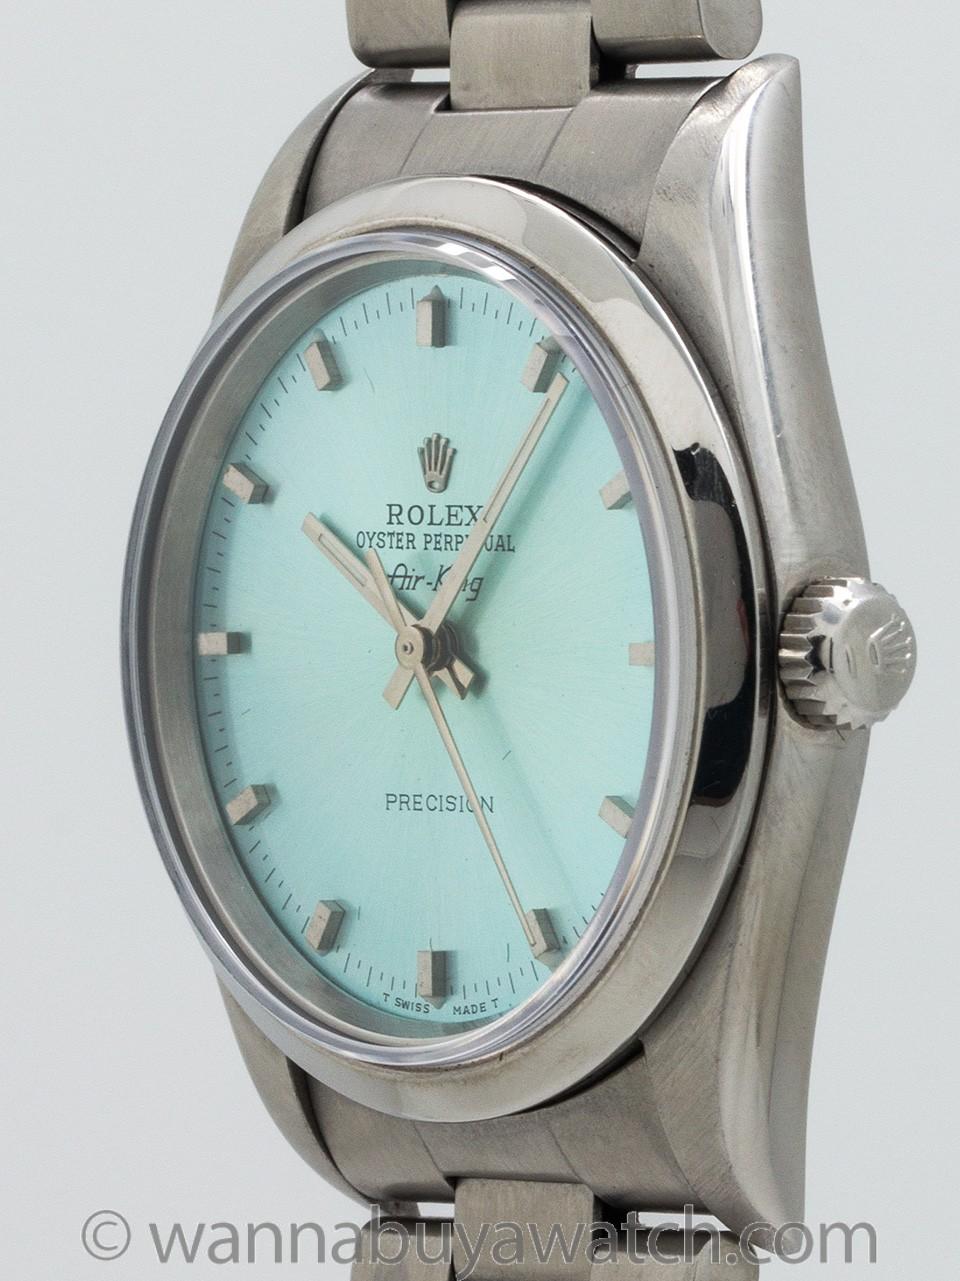 Rolex Oyster Perpetual ref 14000 circa 1996